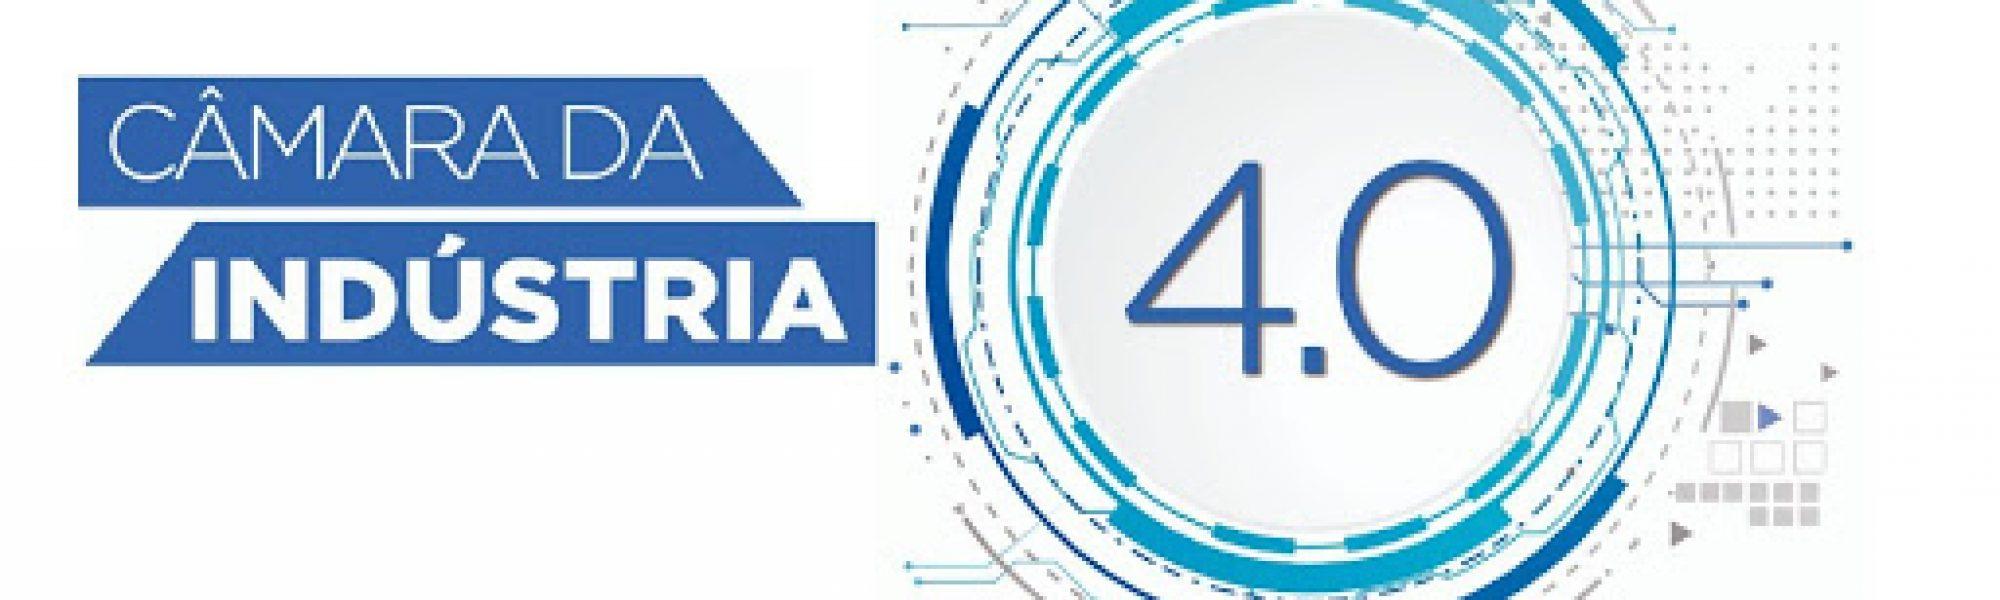 Camara Industria 40